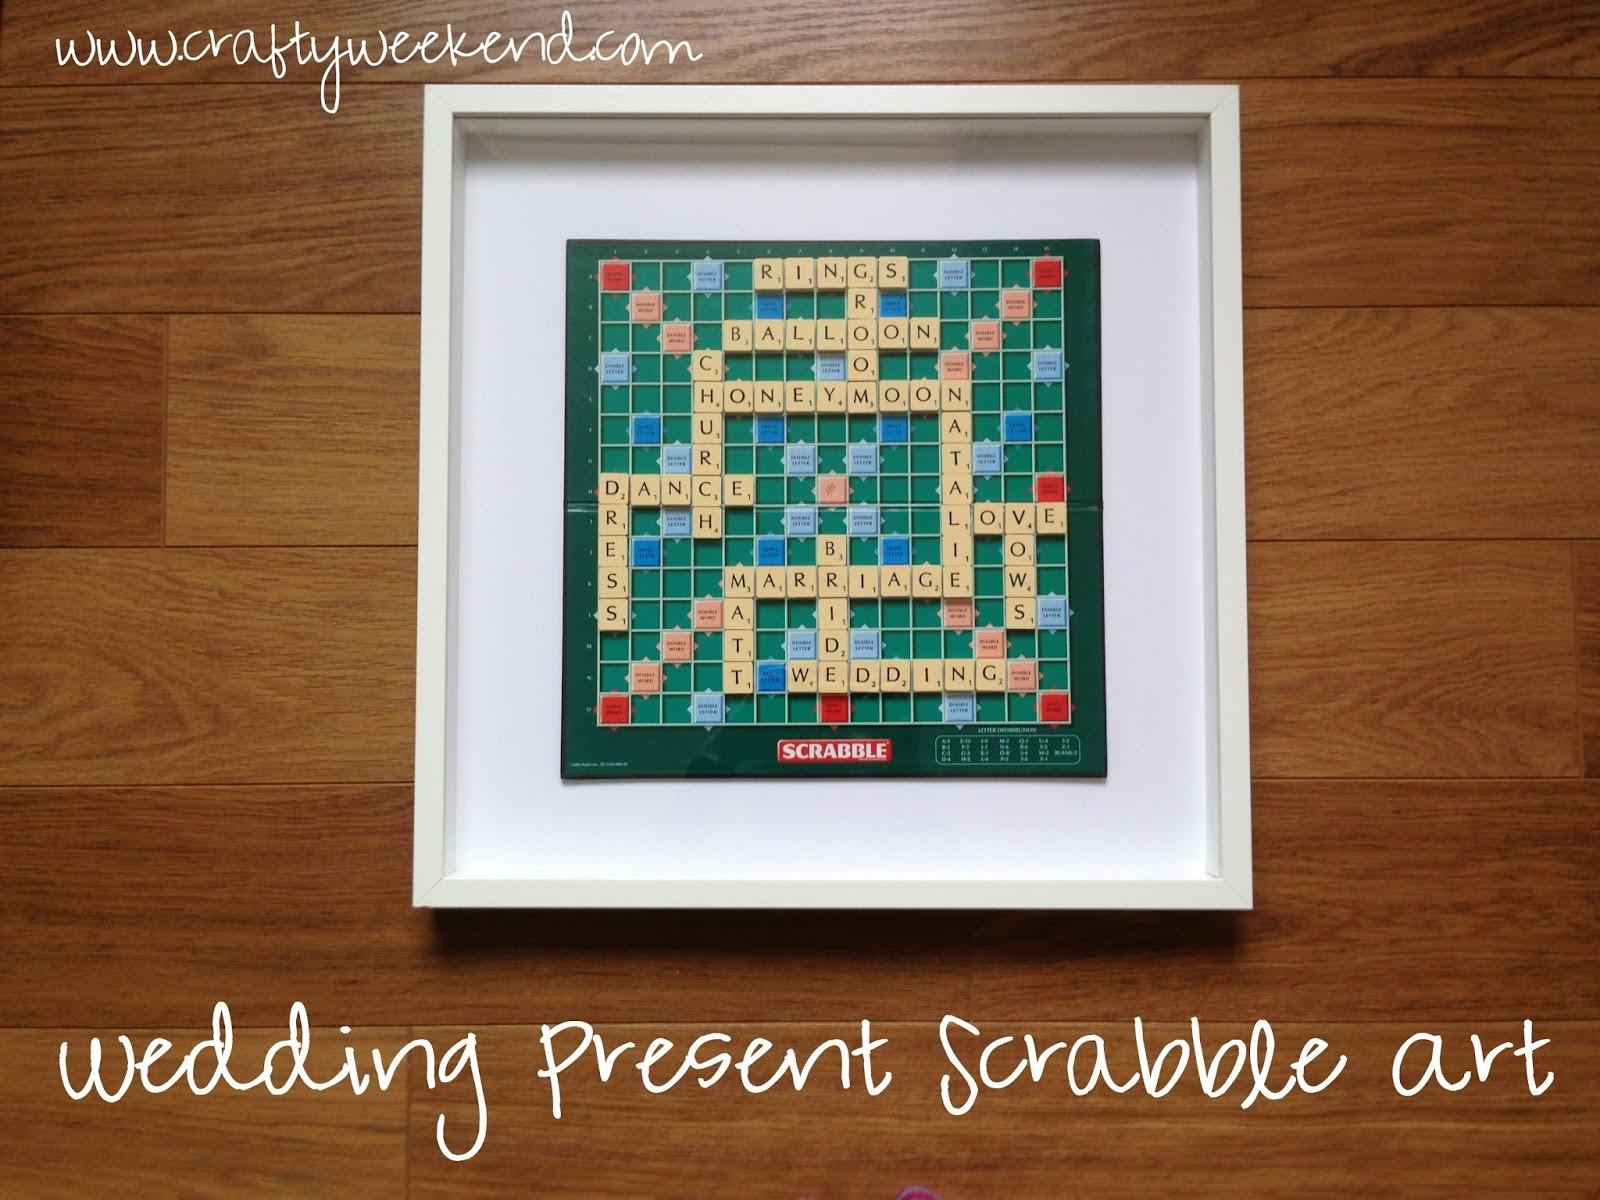 Personalised Wedding Present Scrabble Word Art